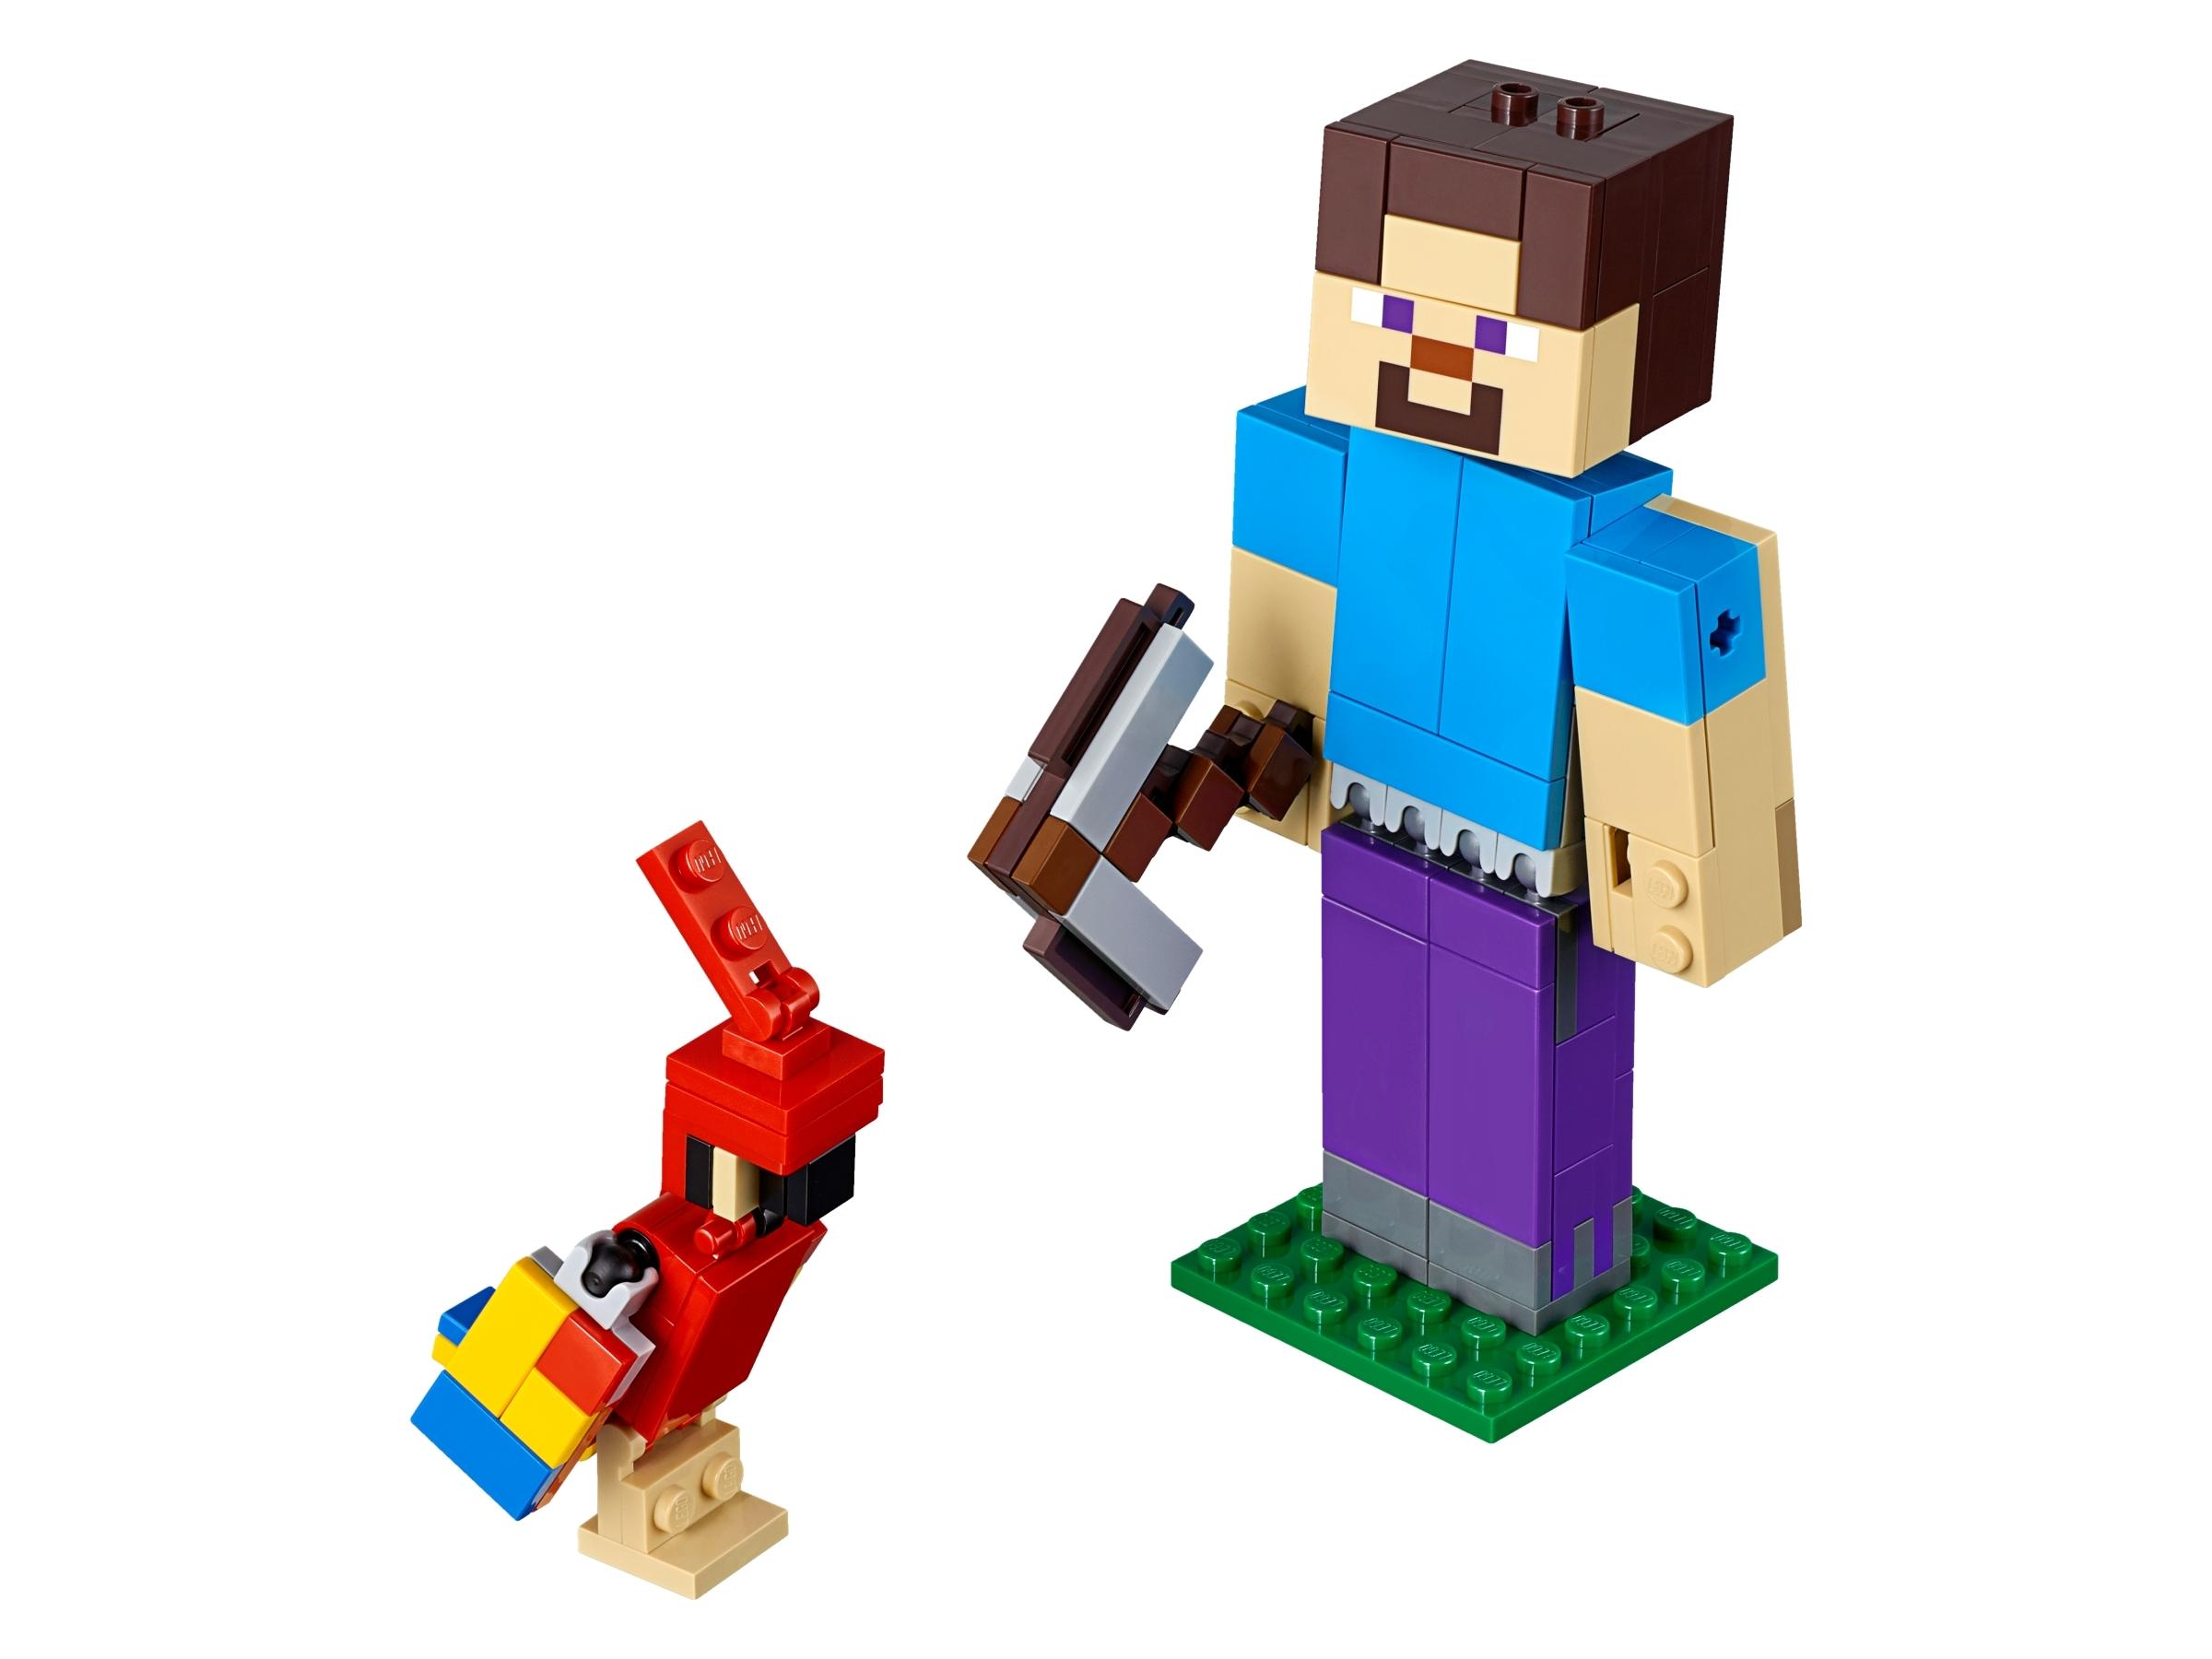 Lego Minecraft Steve BigFig with Parrot